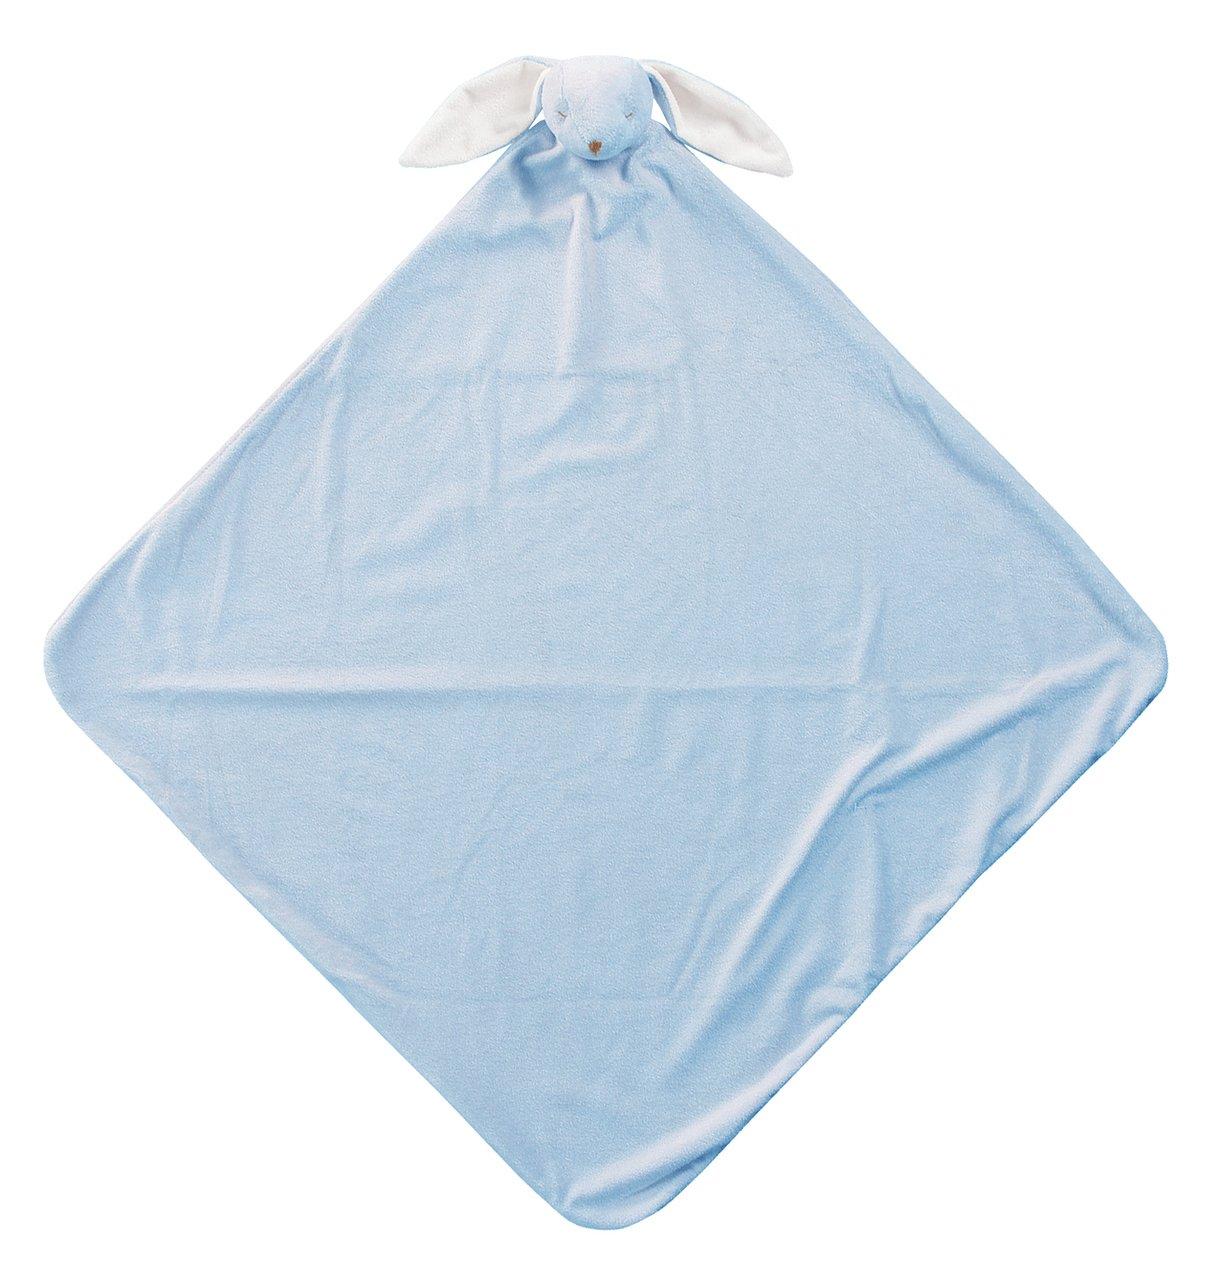 Angel Dear Napping Blanket, Blue Bunny durch Angel Dear